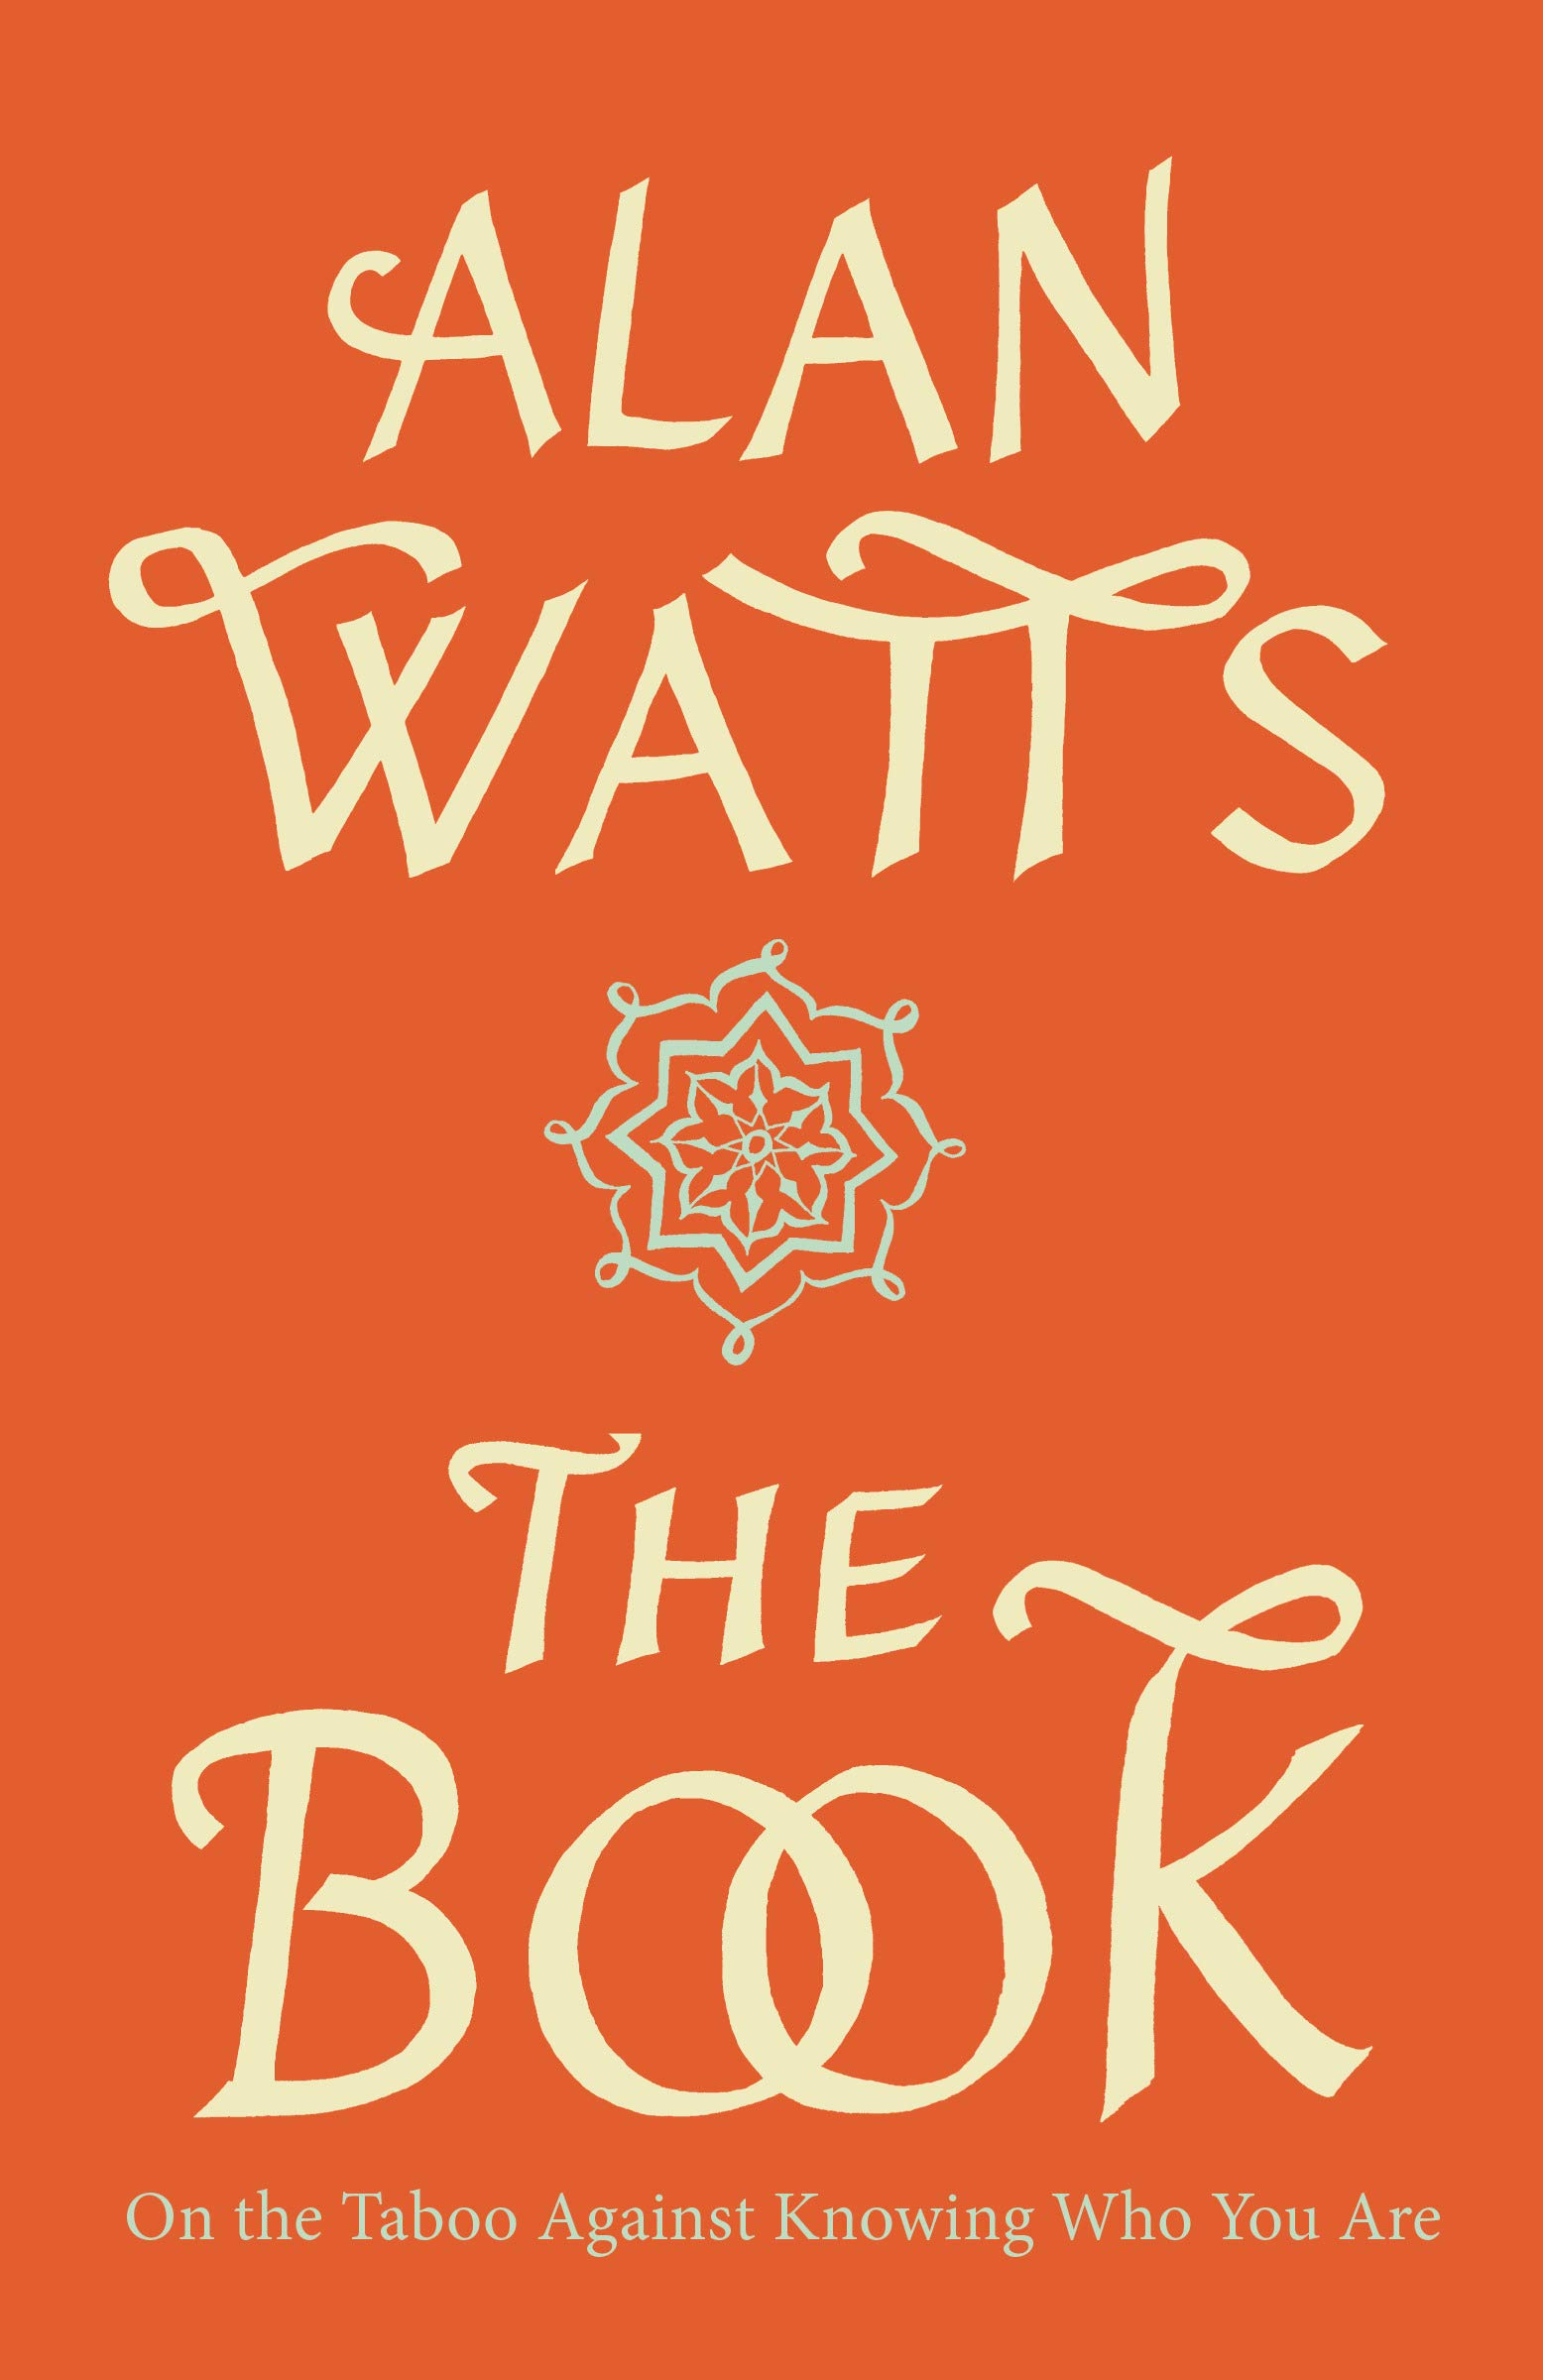 Alan Watts The Book cover art